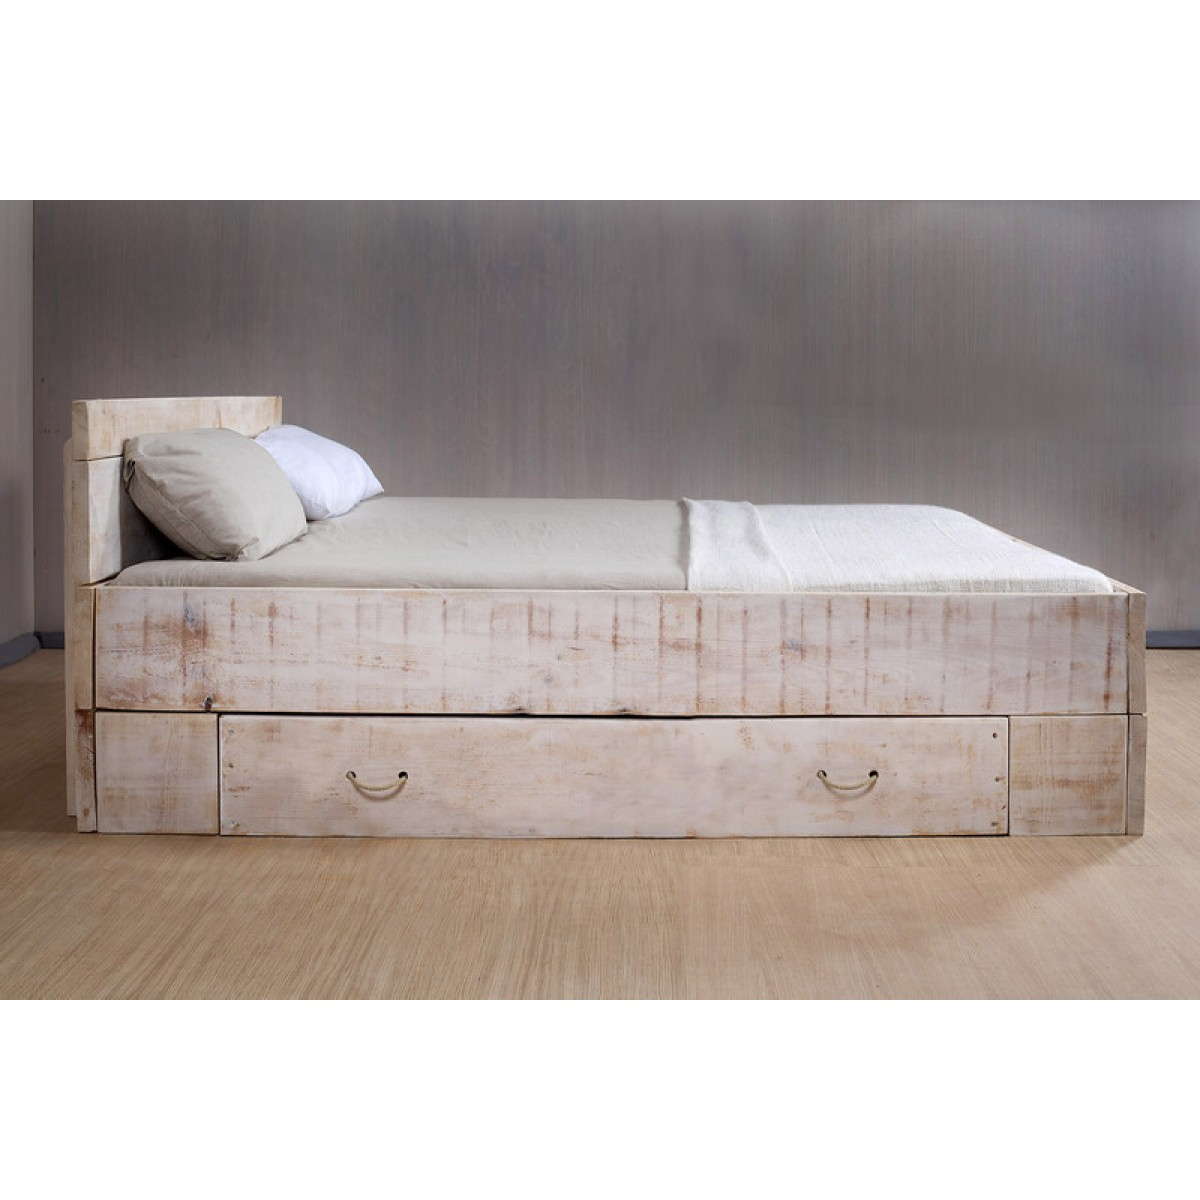 FraaiBerlin Bett Lunas 1x Bettkasten groß Kreidefarbe